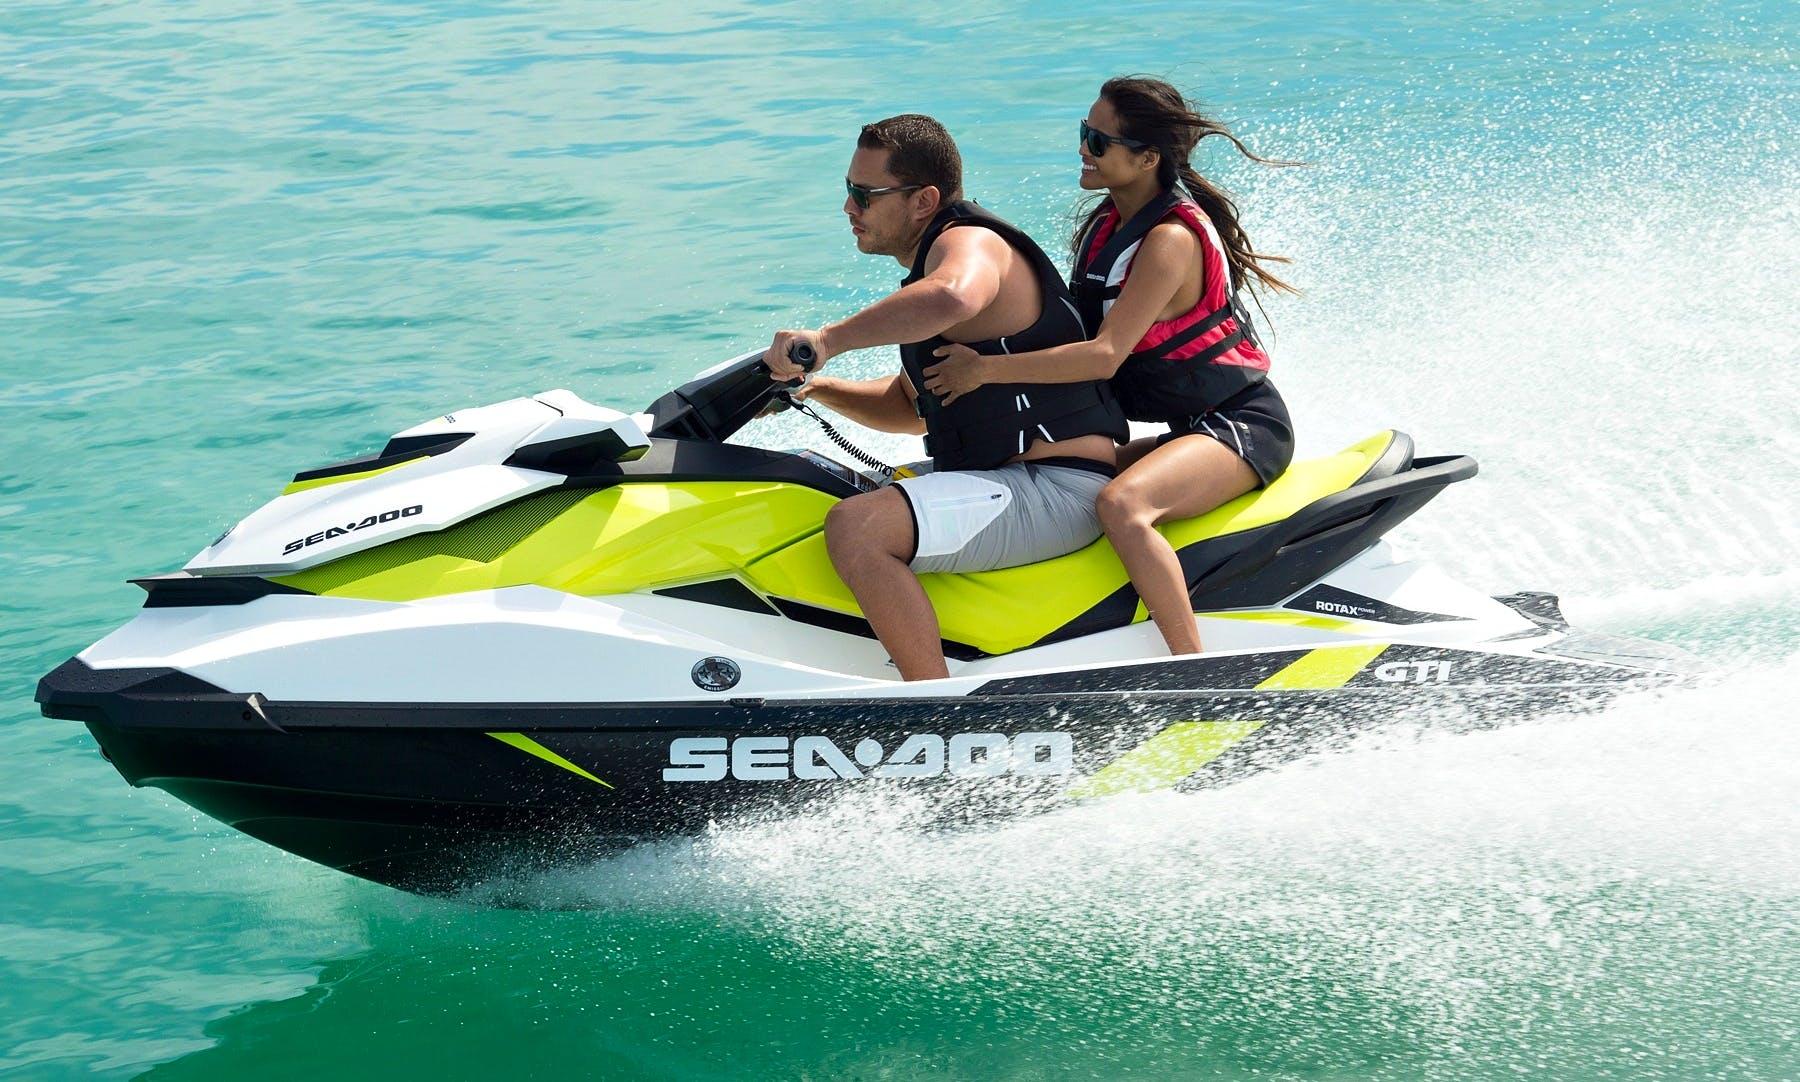 Sea-Doo GTI 900 Jet Ski Lessons in George Town, Cayman Islands